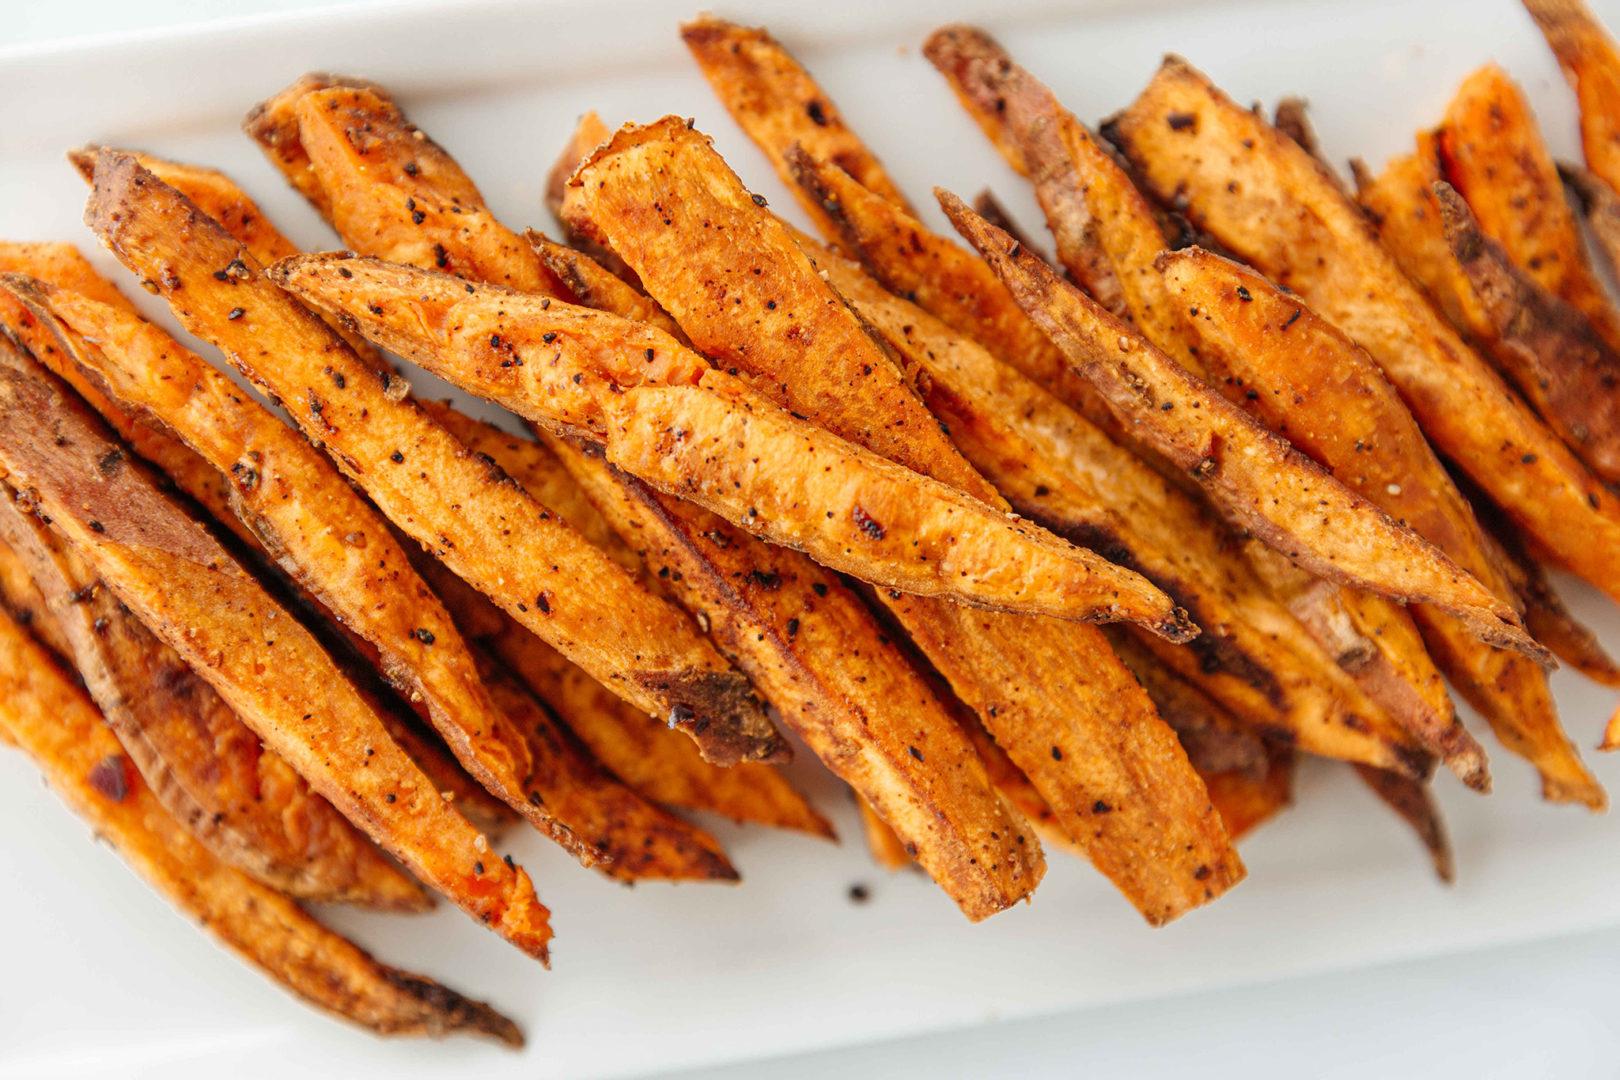 coffee sweet potato fries with bbq sauce